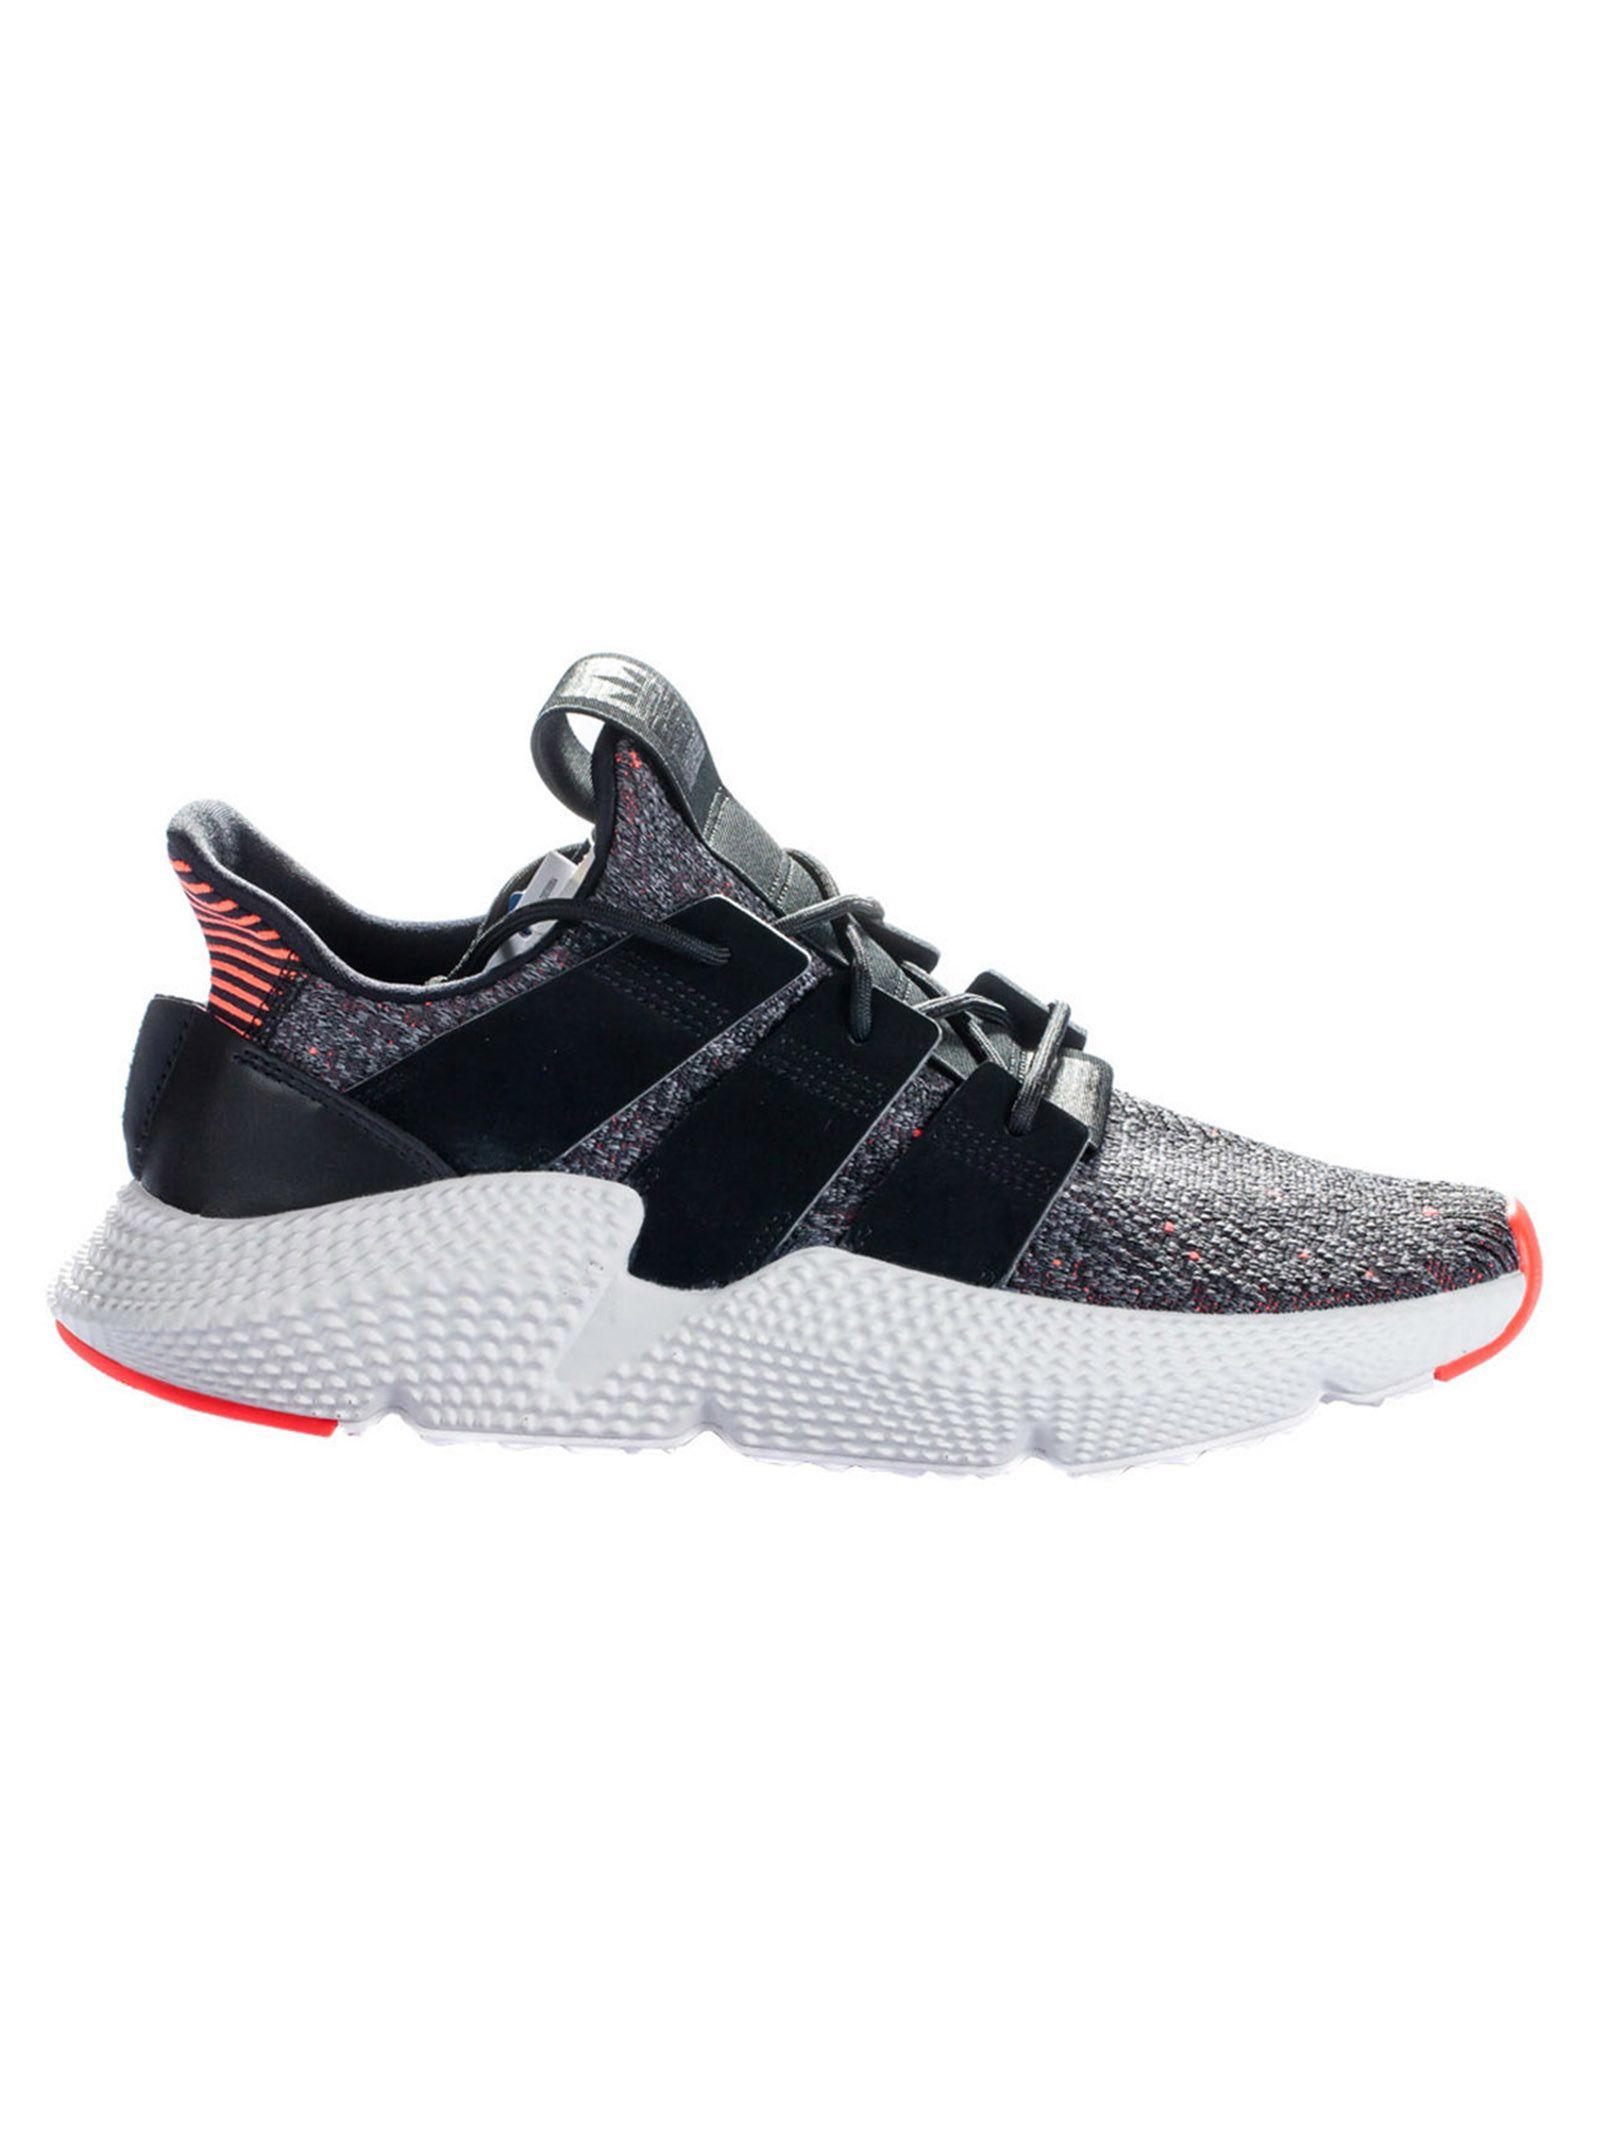 Adidas Originals Prophere Sneakers